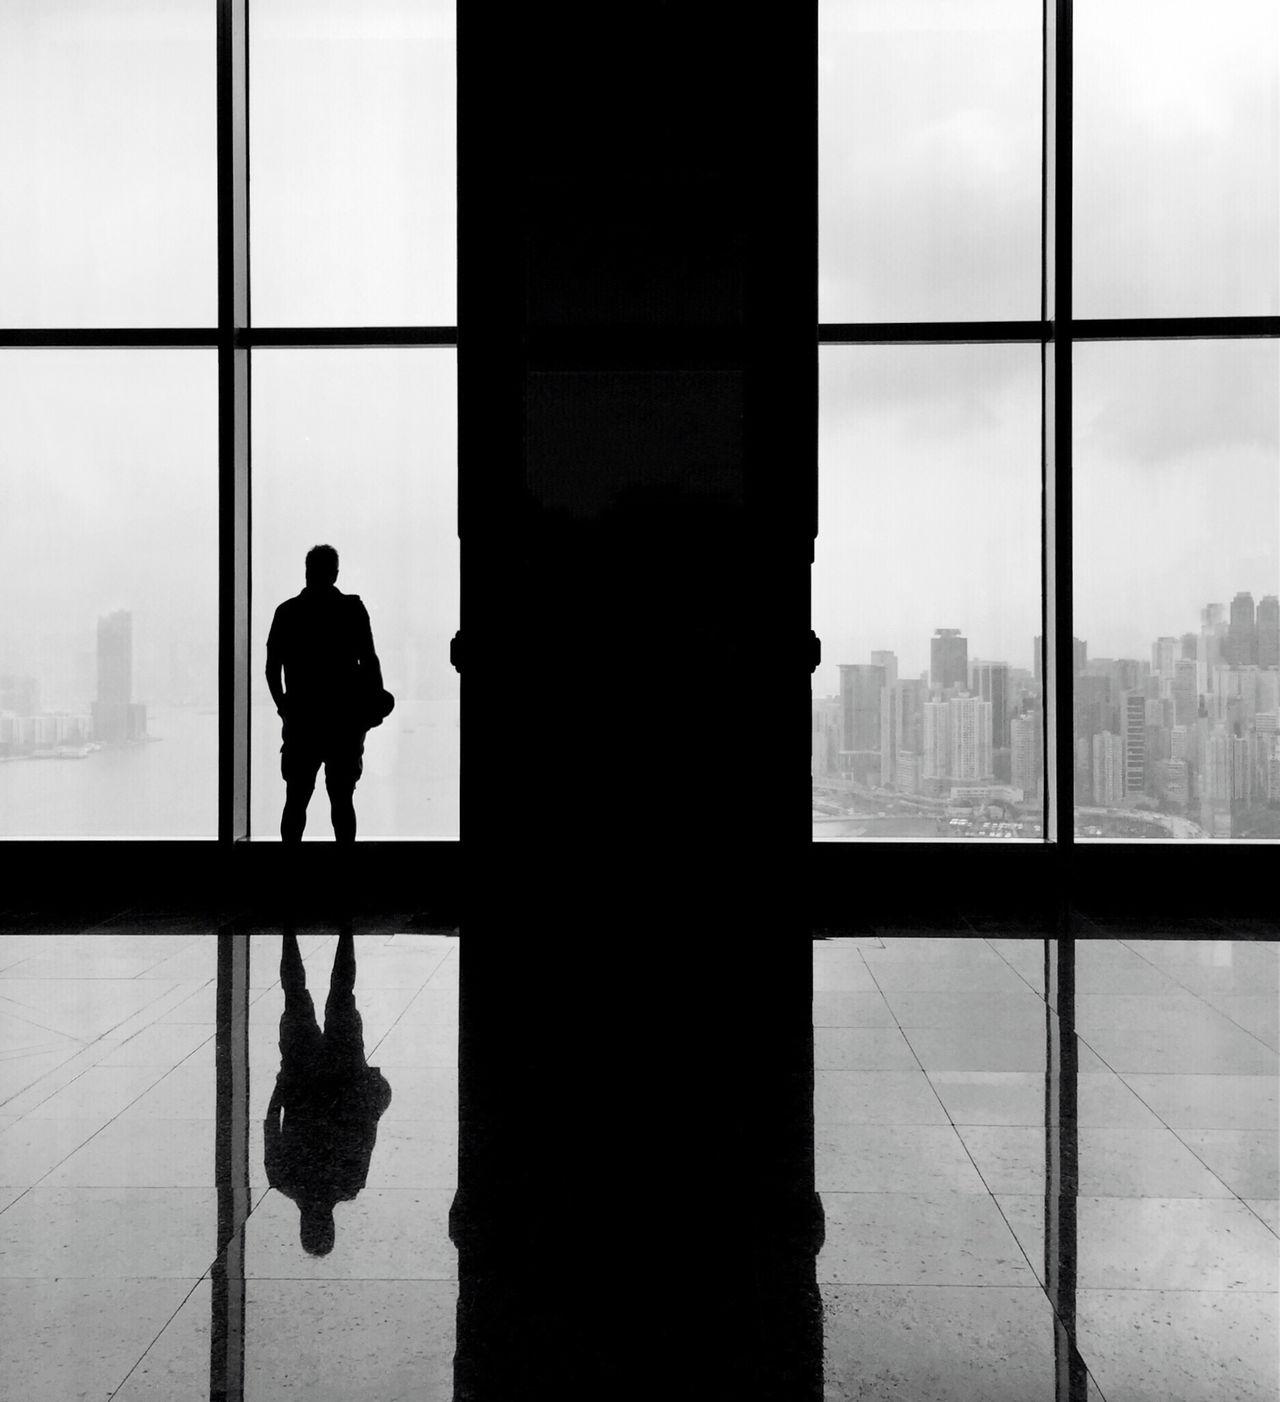 Silhouette man looking through window in building